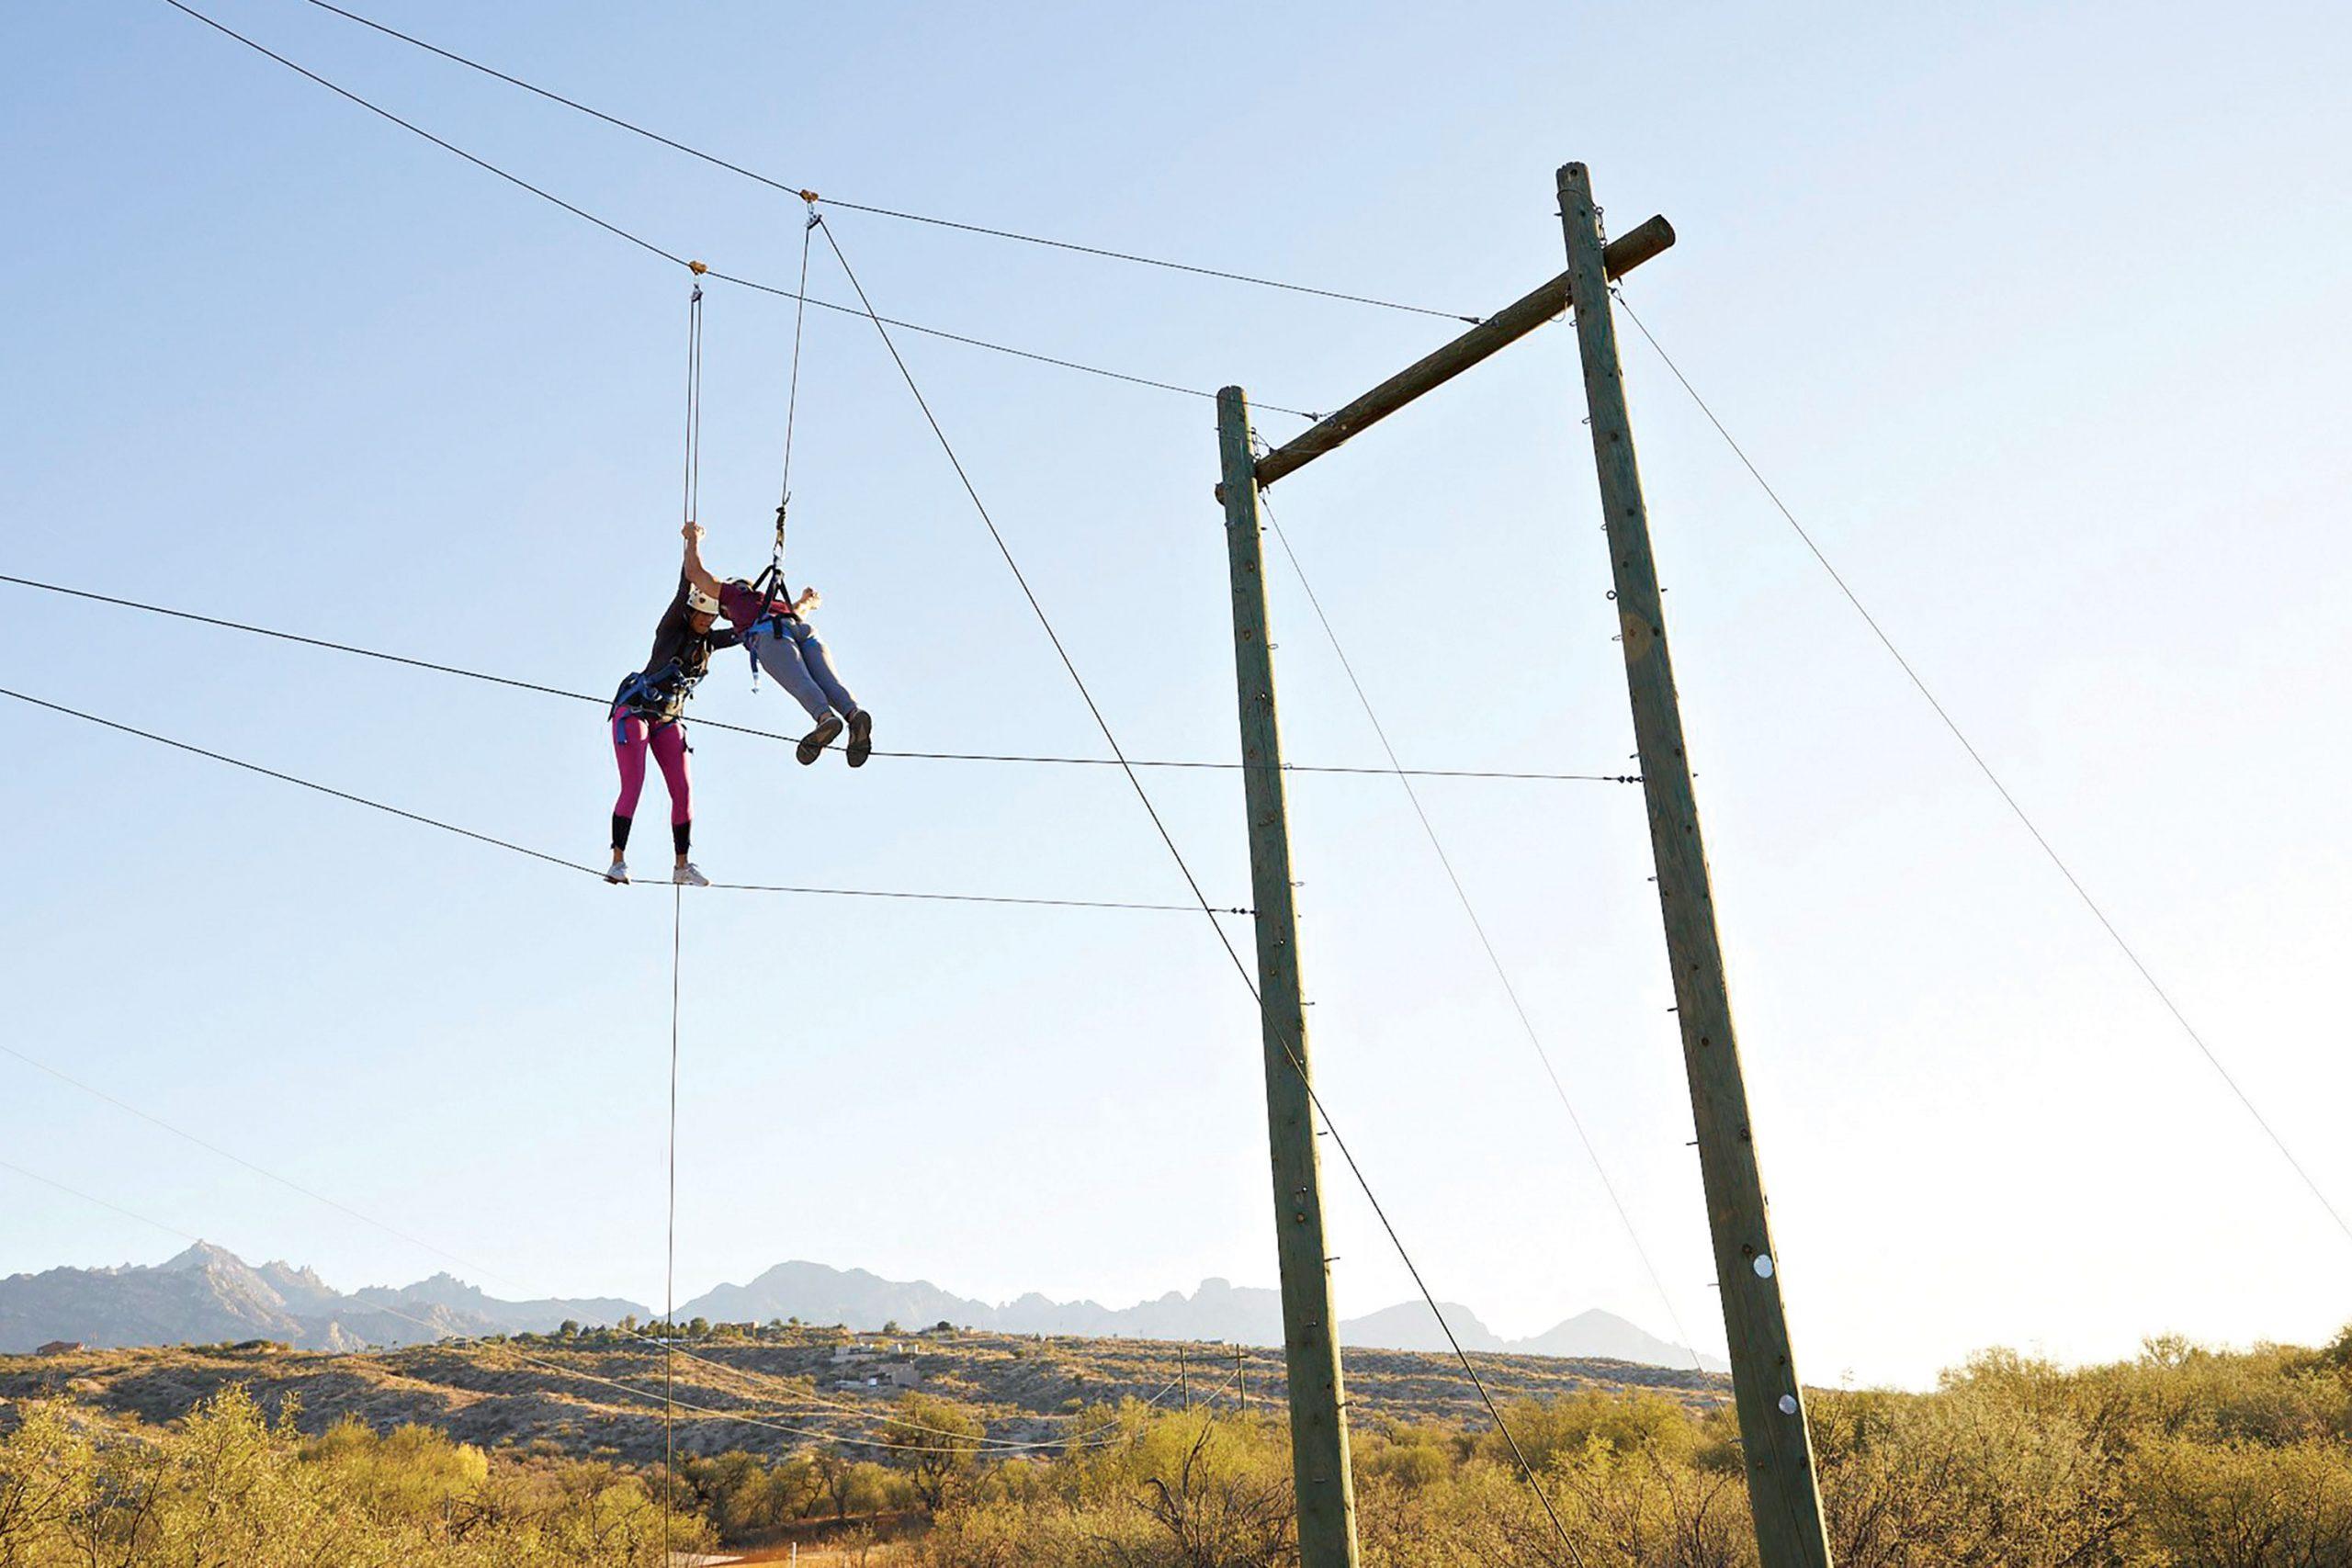 Tightrope therapy at Miraval Arizona; Photo courtesy Miraval Arizona